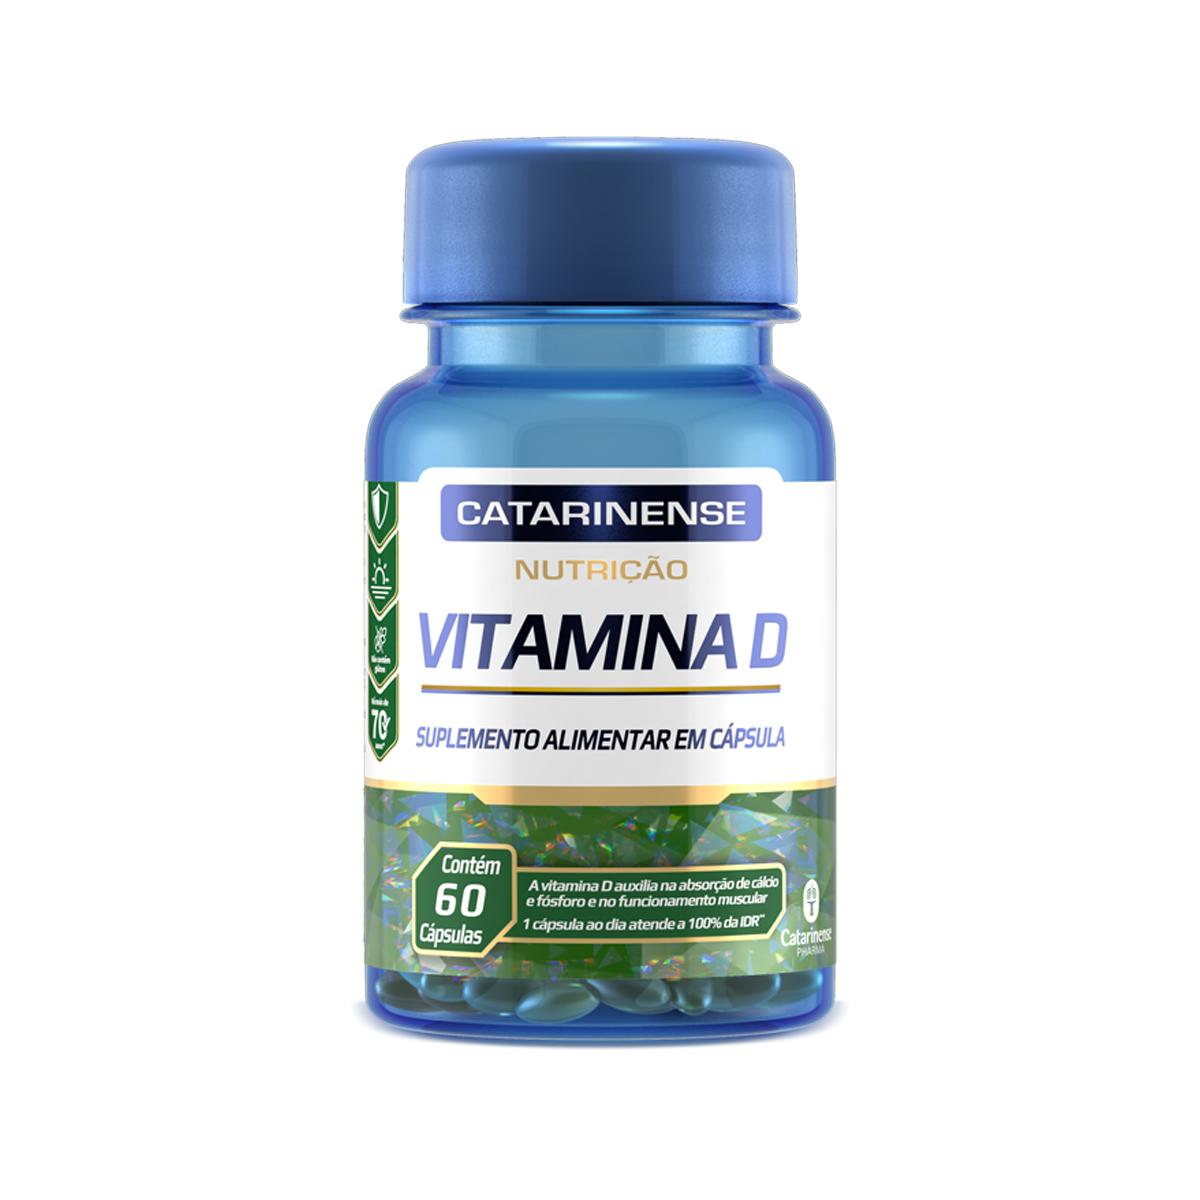 Vitamina D 250mg 60 Cápsulas  - Catarinense